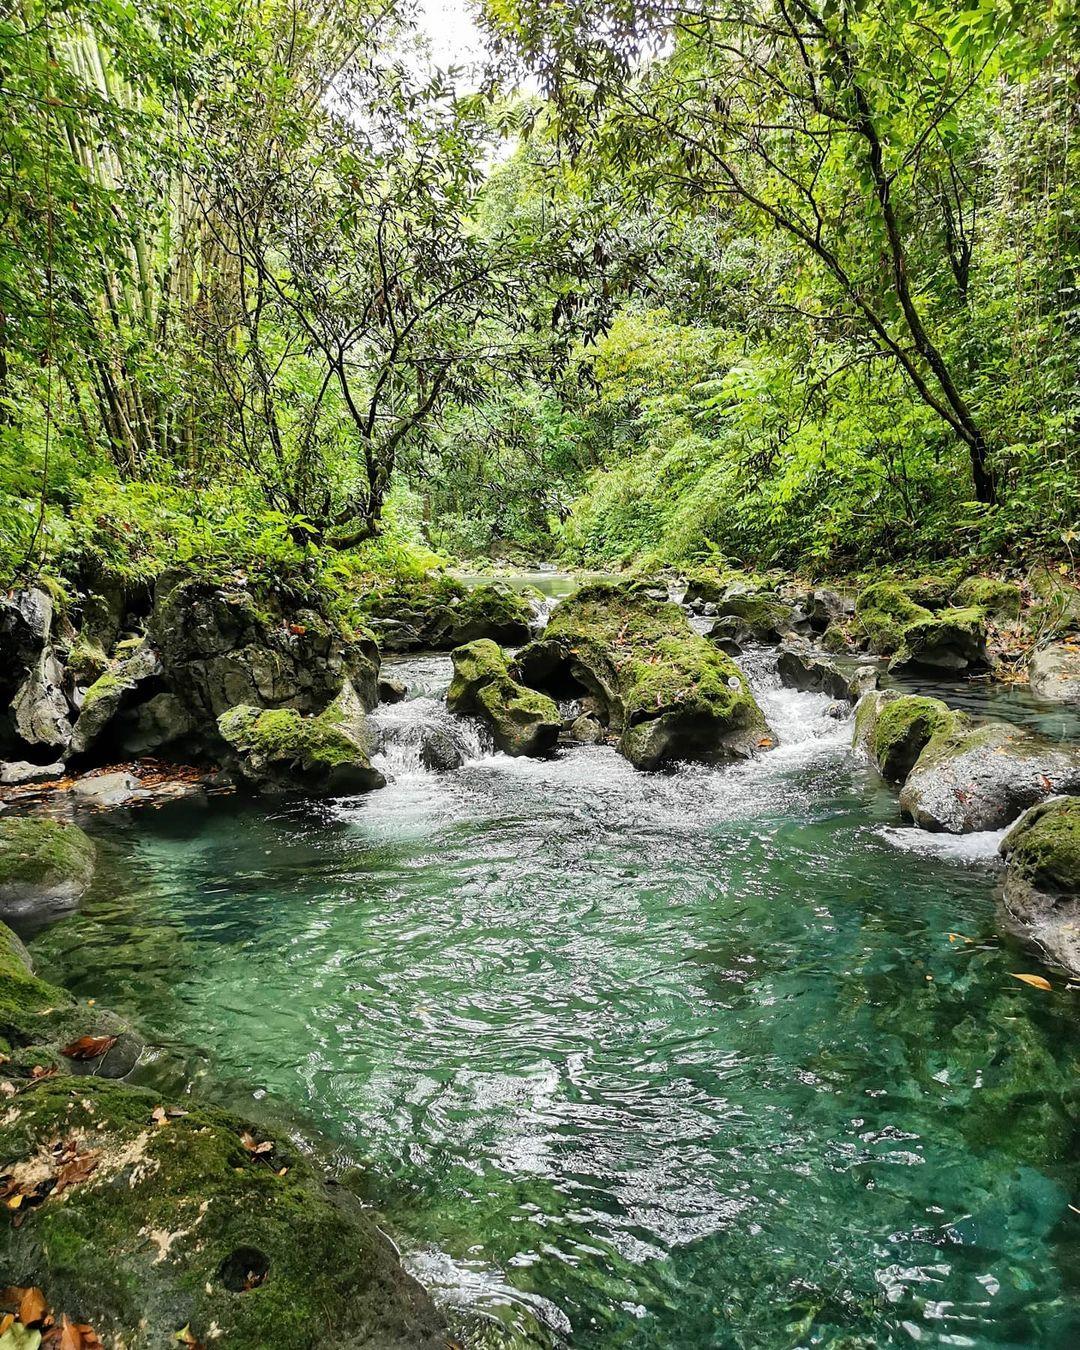 Jamaica instagram spots, most instagrammable places in Jamaica, Jamaica photos, Jamaica photography, Reach Falls